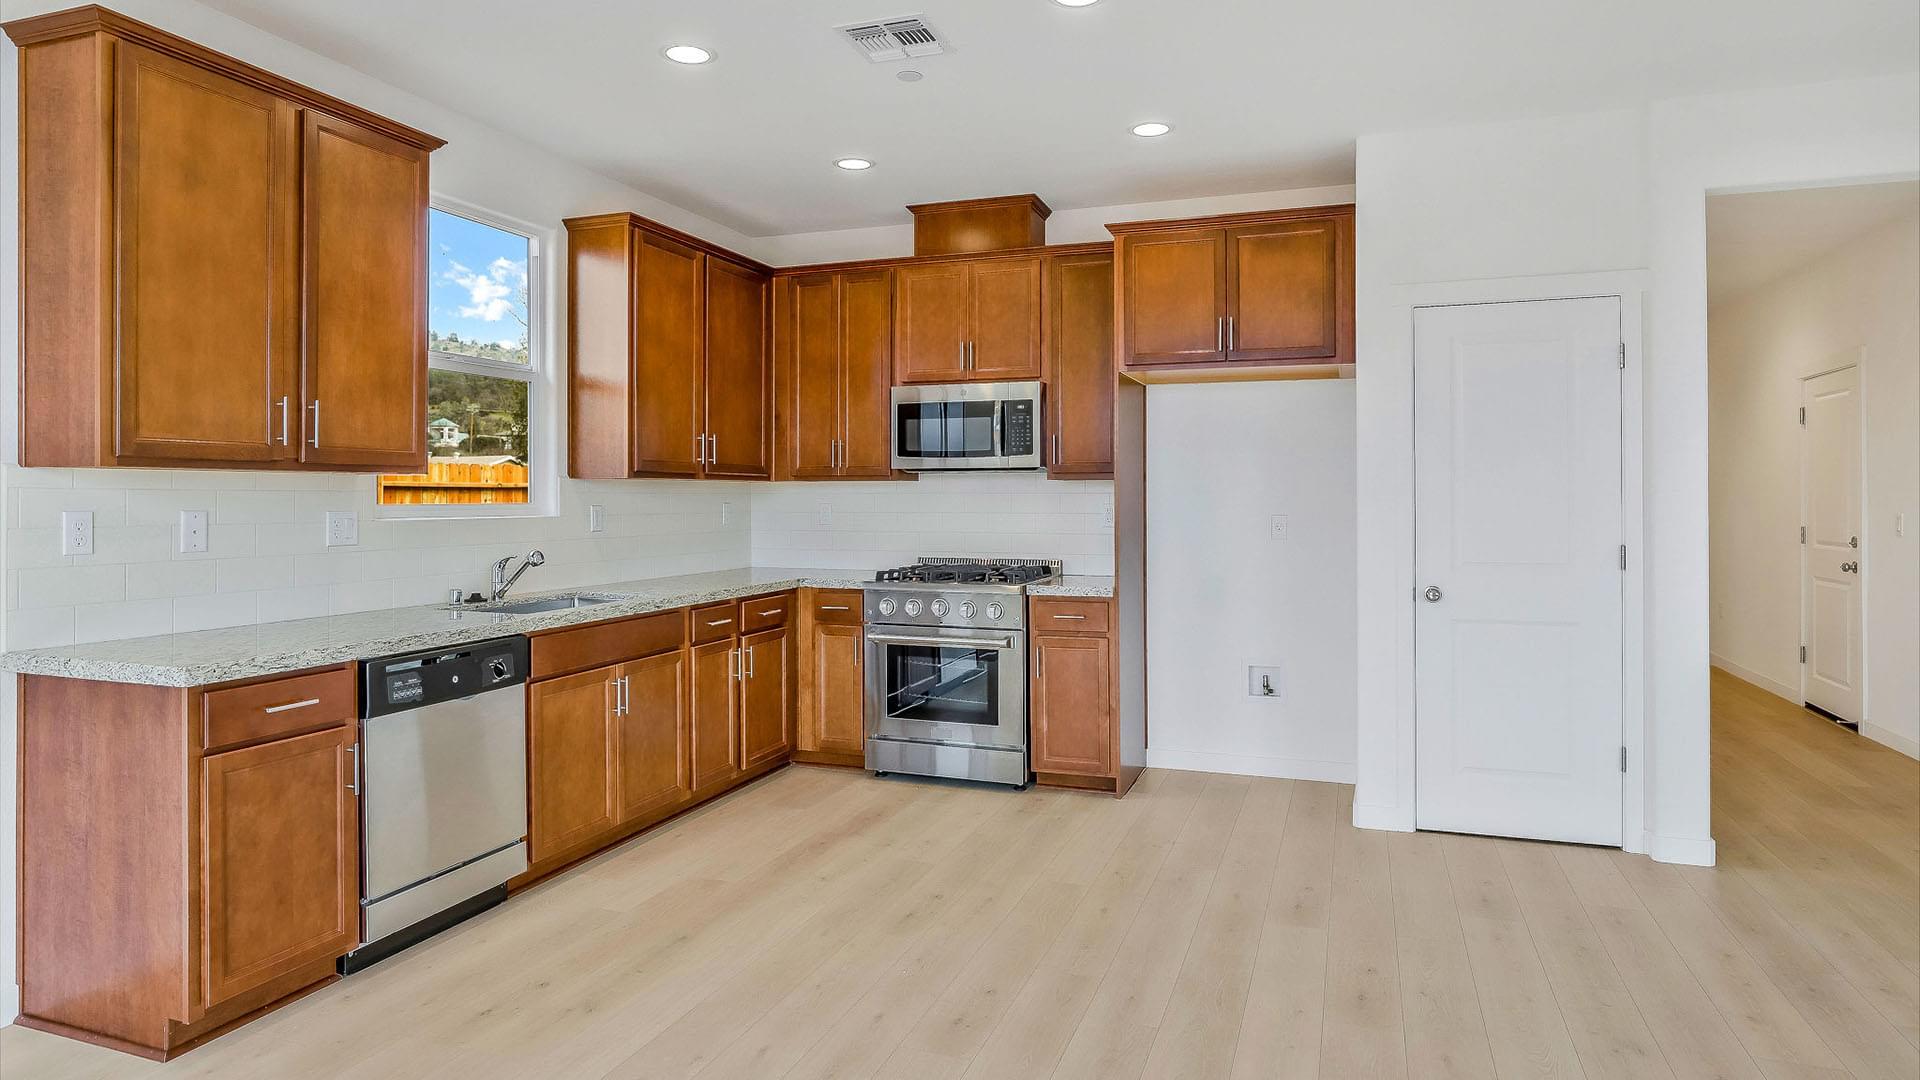 Residence 1 Kitchen